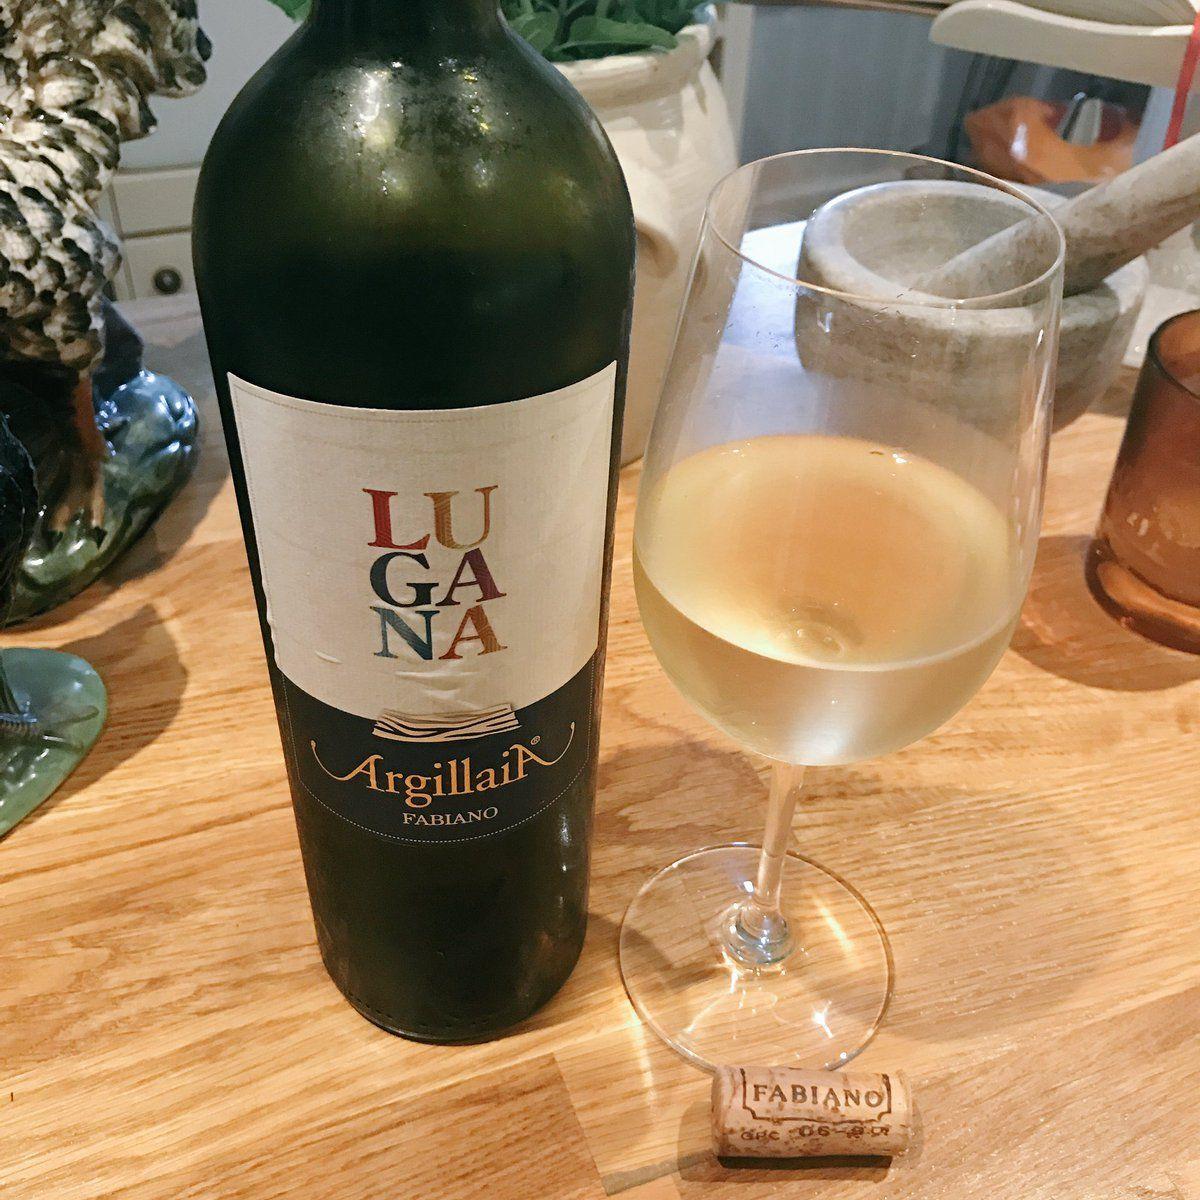 Argillaia - Lugana - Vini Fabiano #naming #packaging #design #vino